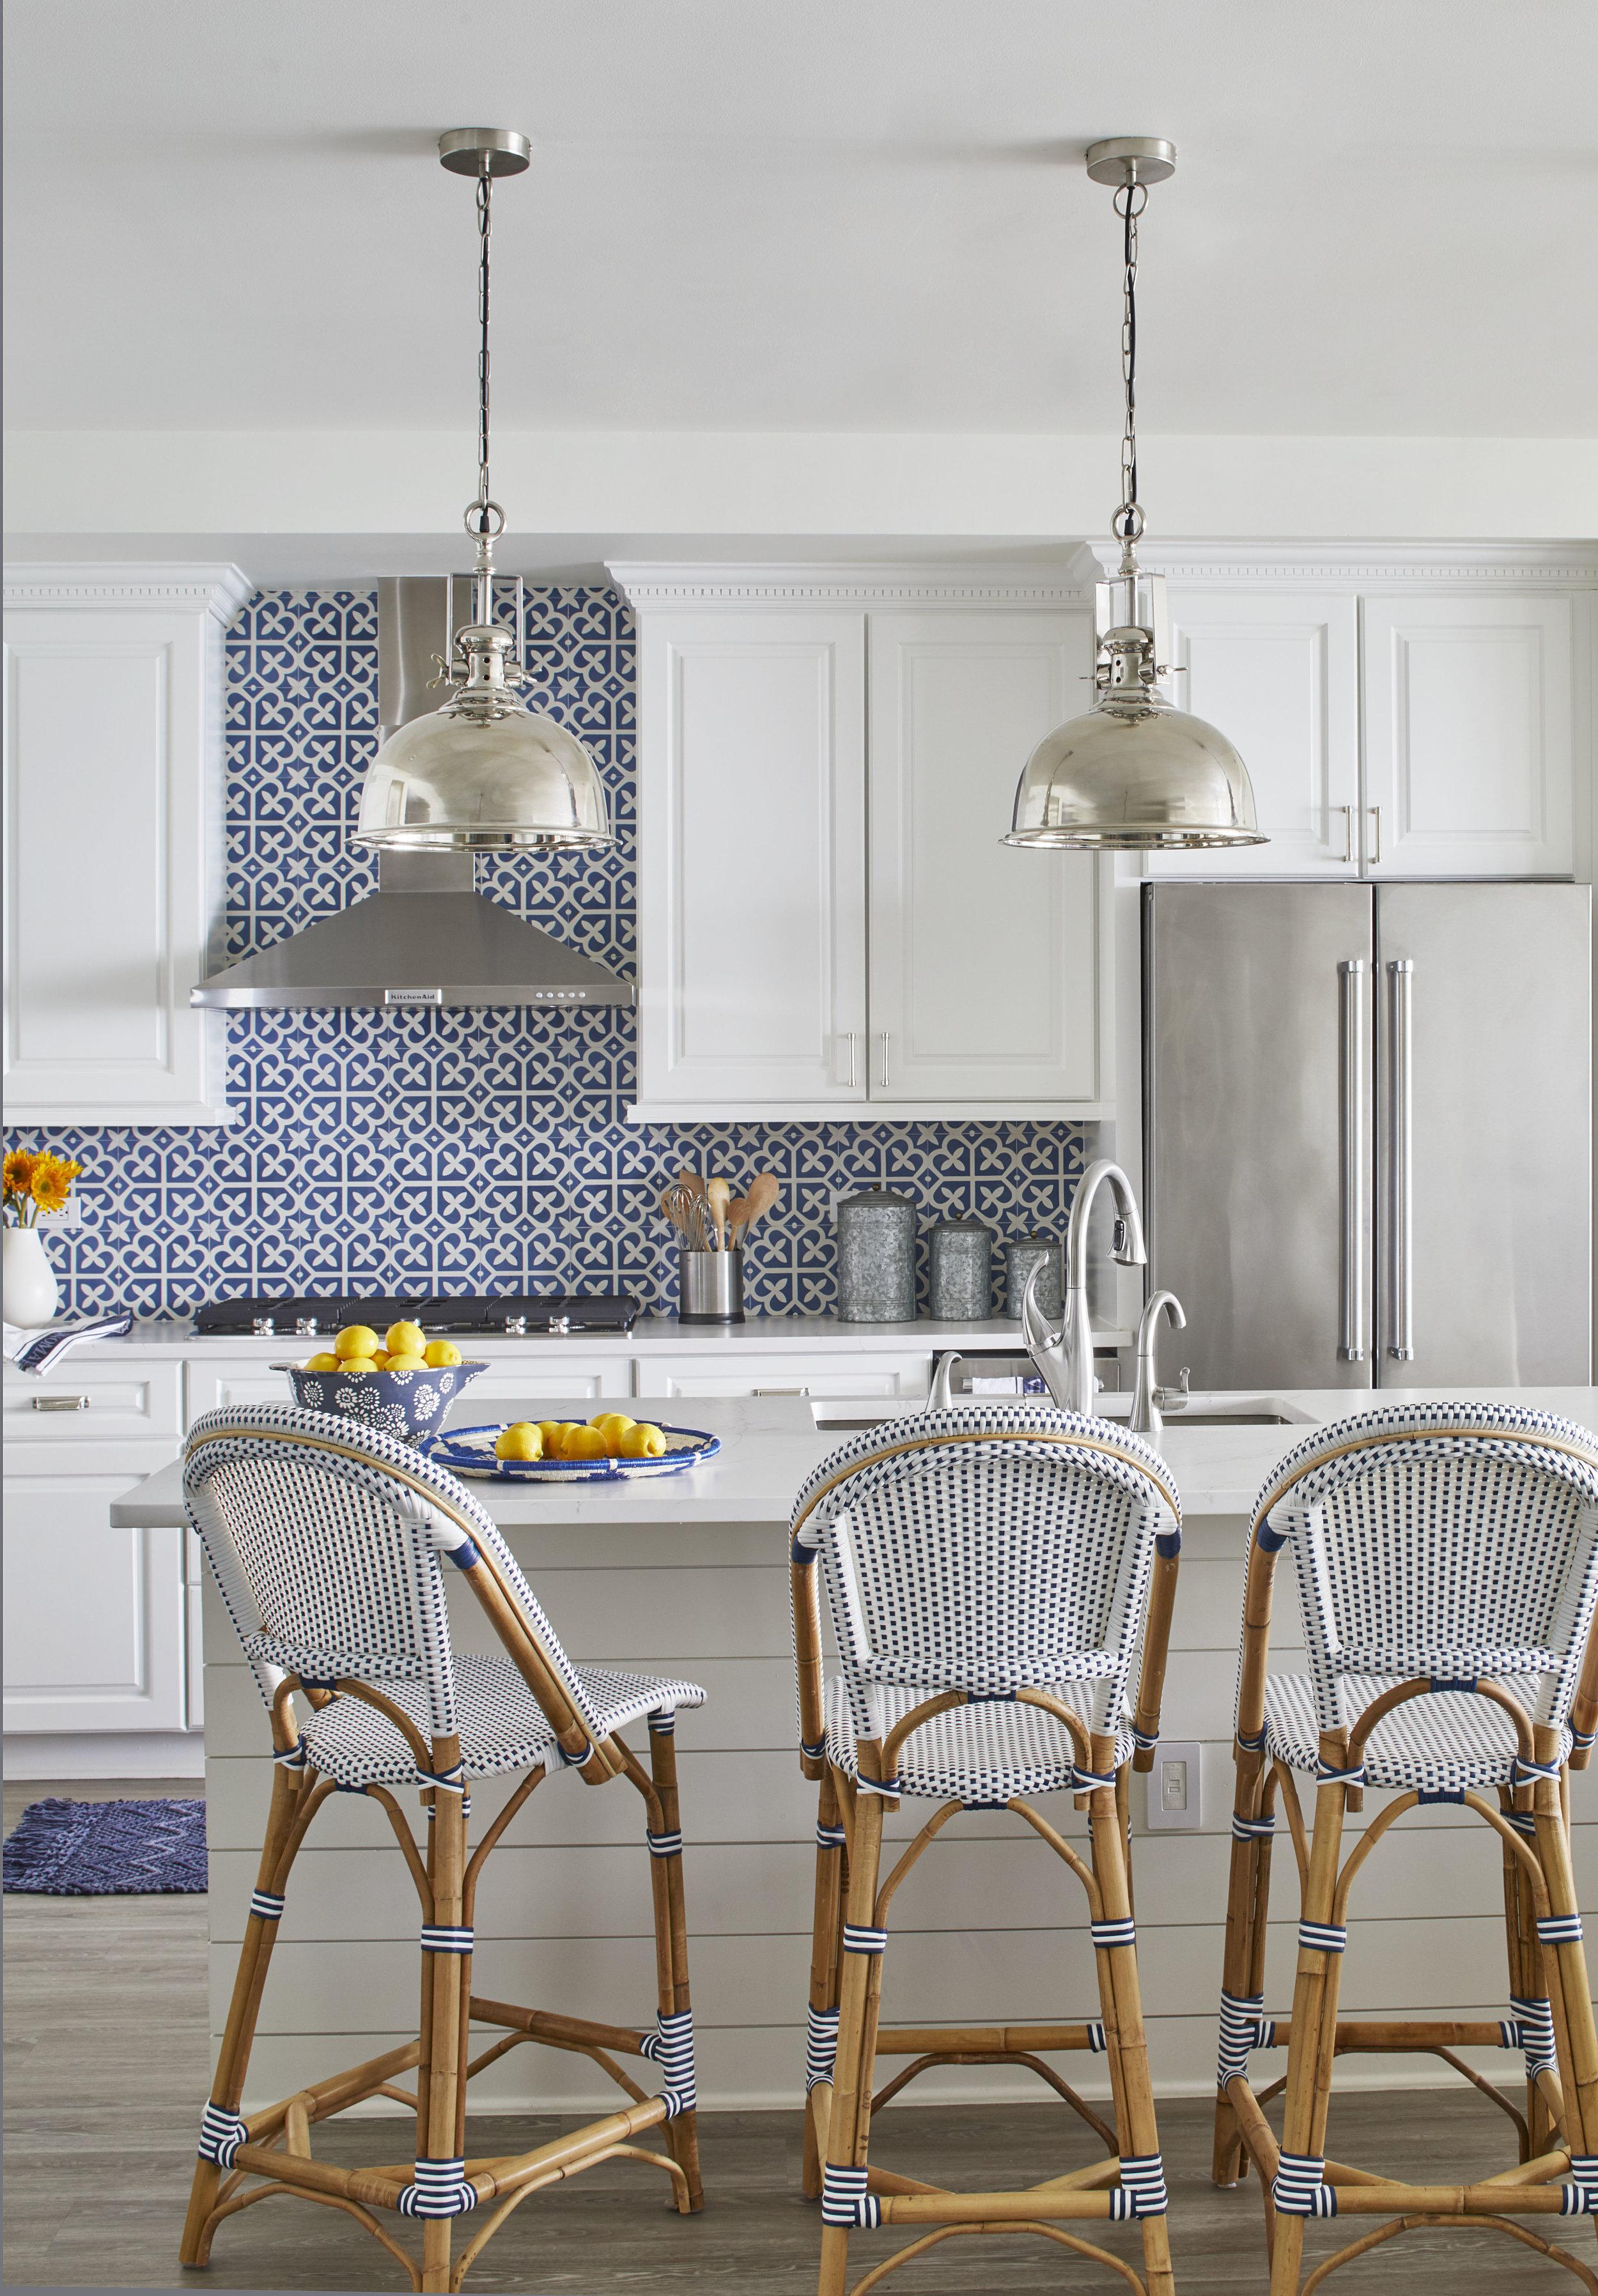 Gabrielson_BocianBeachHouse_Kitchen2.jpg